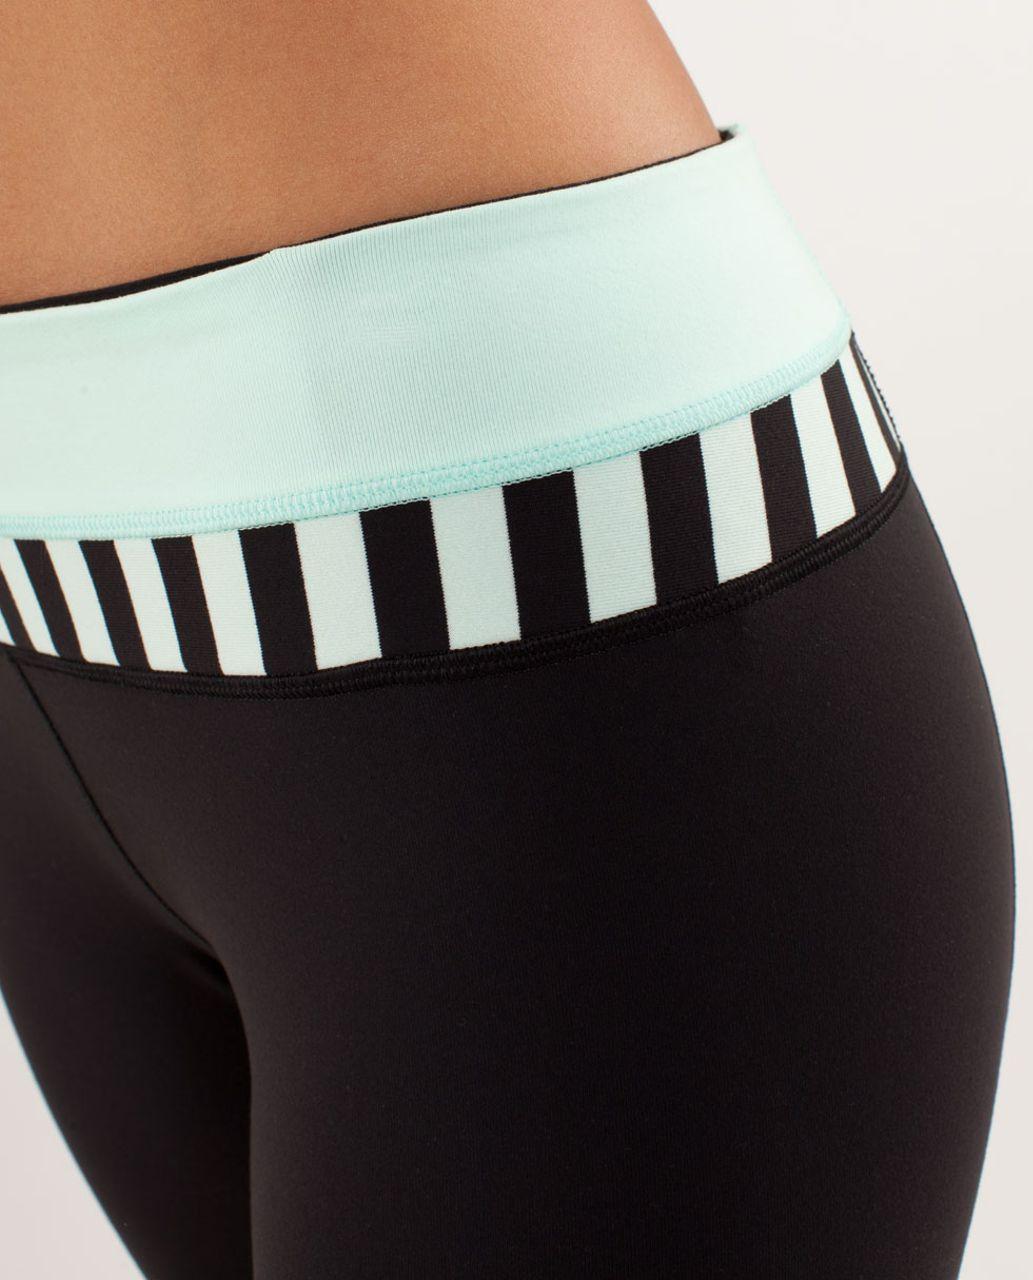 Lululemon Groove Pant *New (Tall) - Black / Mint Moment / Sea Stripe Mint Moment Black